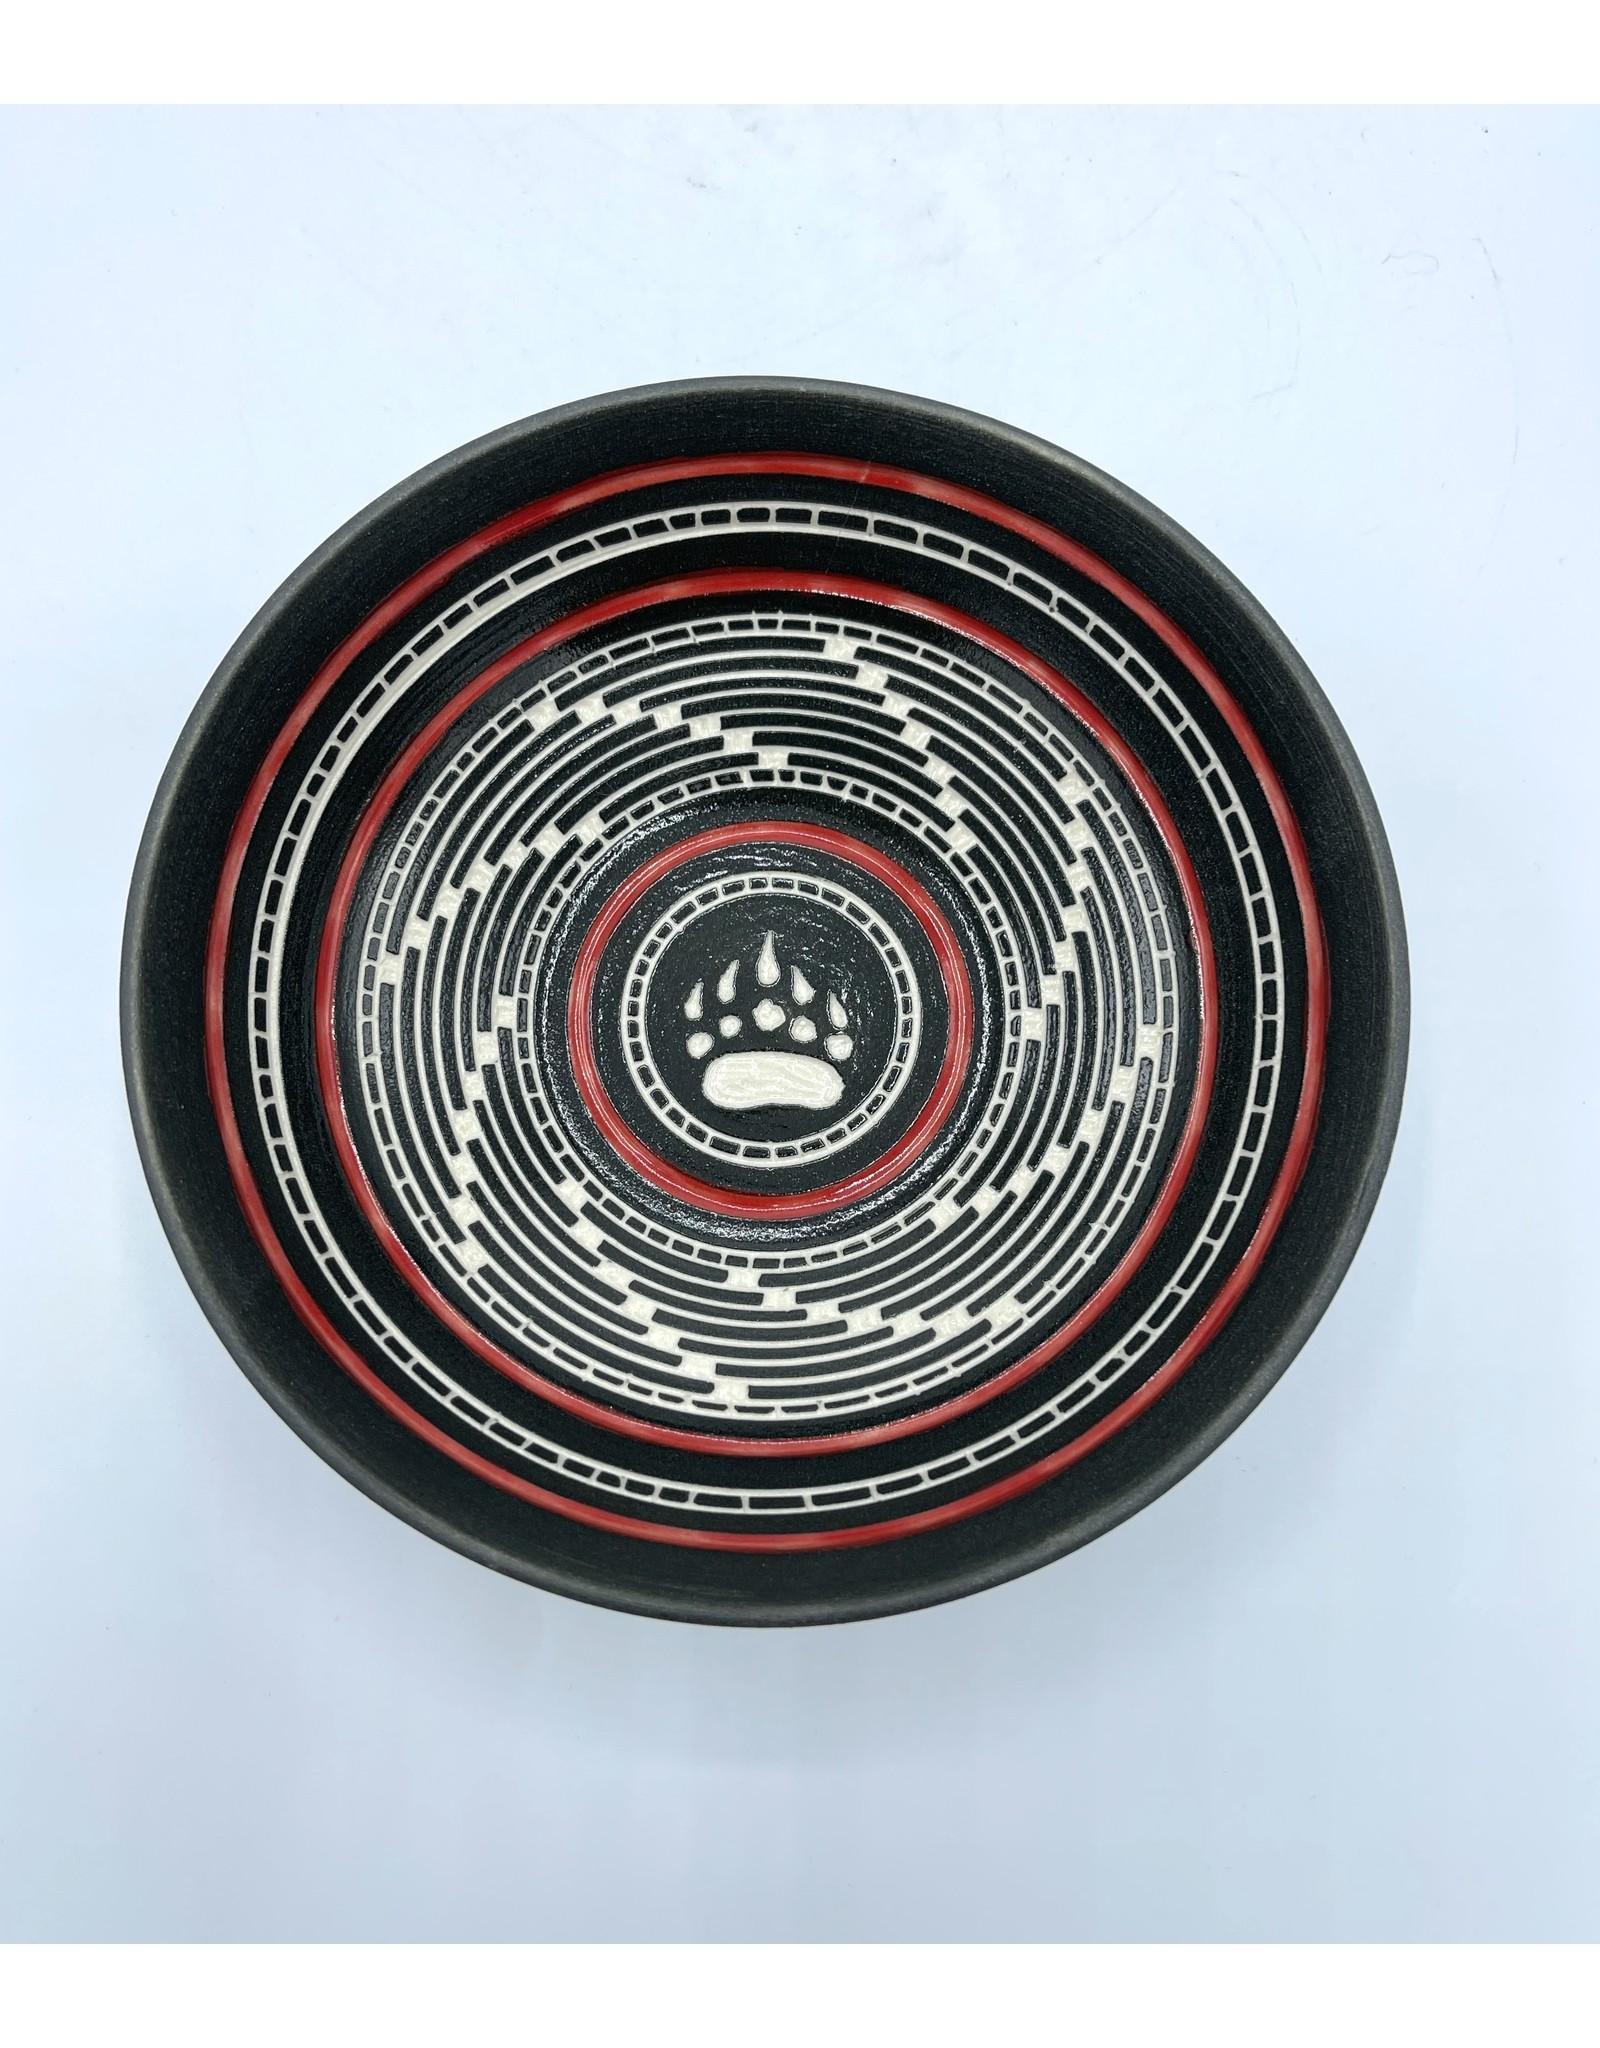 Pottery - #0067